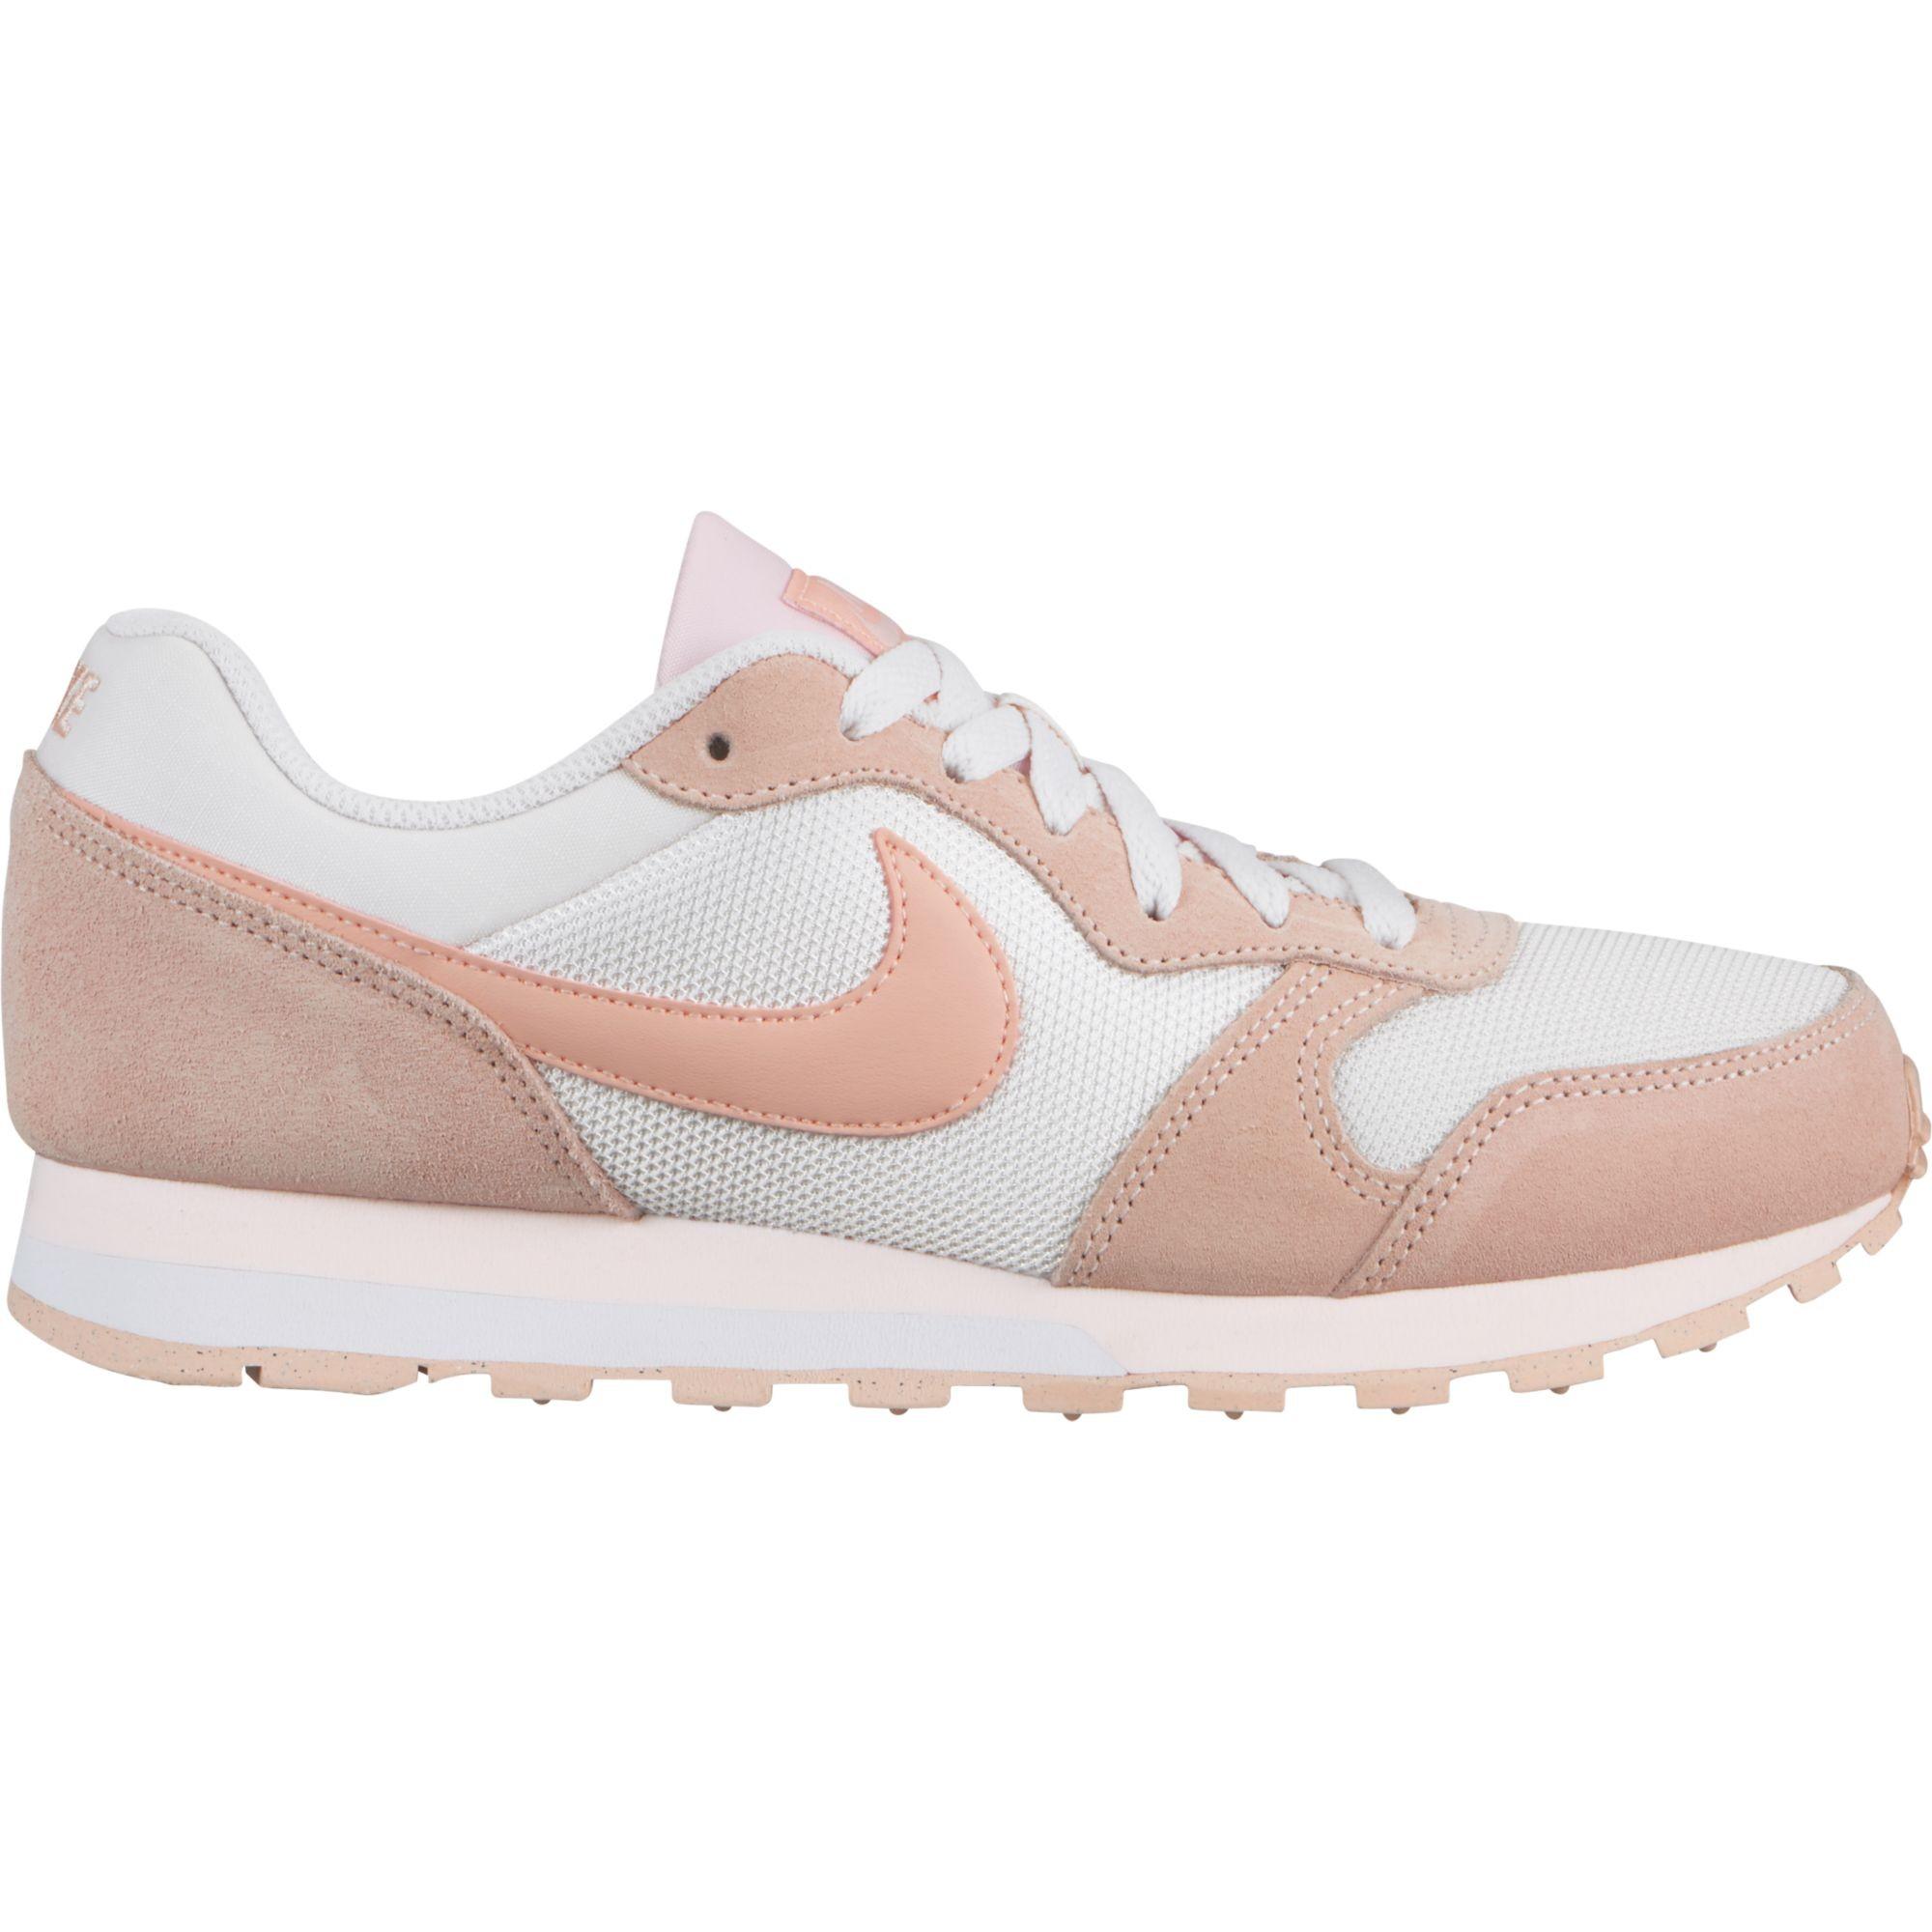 5f0f9e76d Zapatillas Nike Wmns MD Runner 2 749869 604 - Deportes Manzanedo